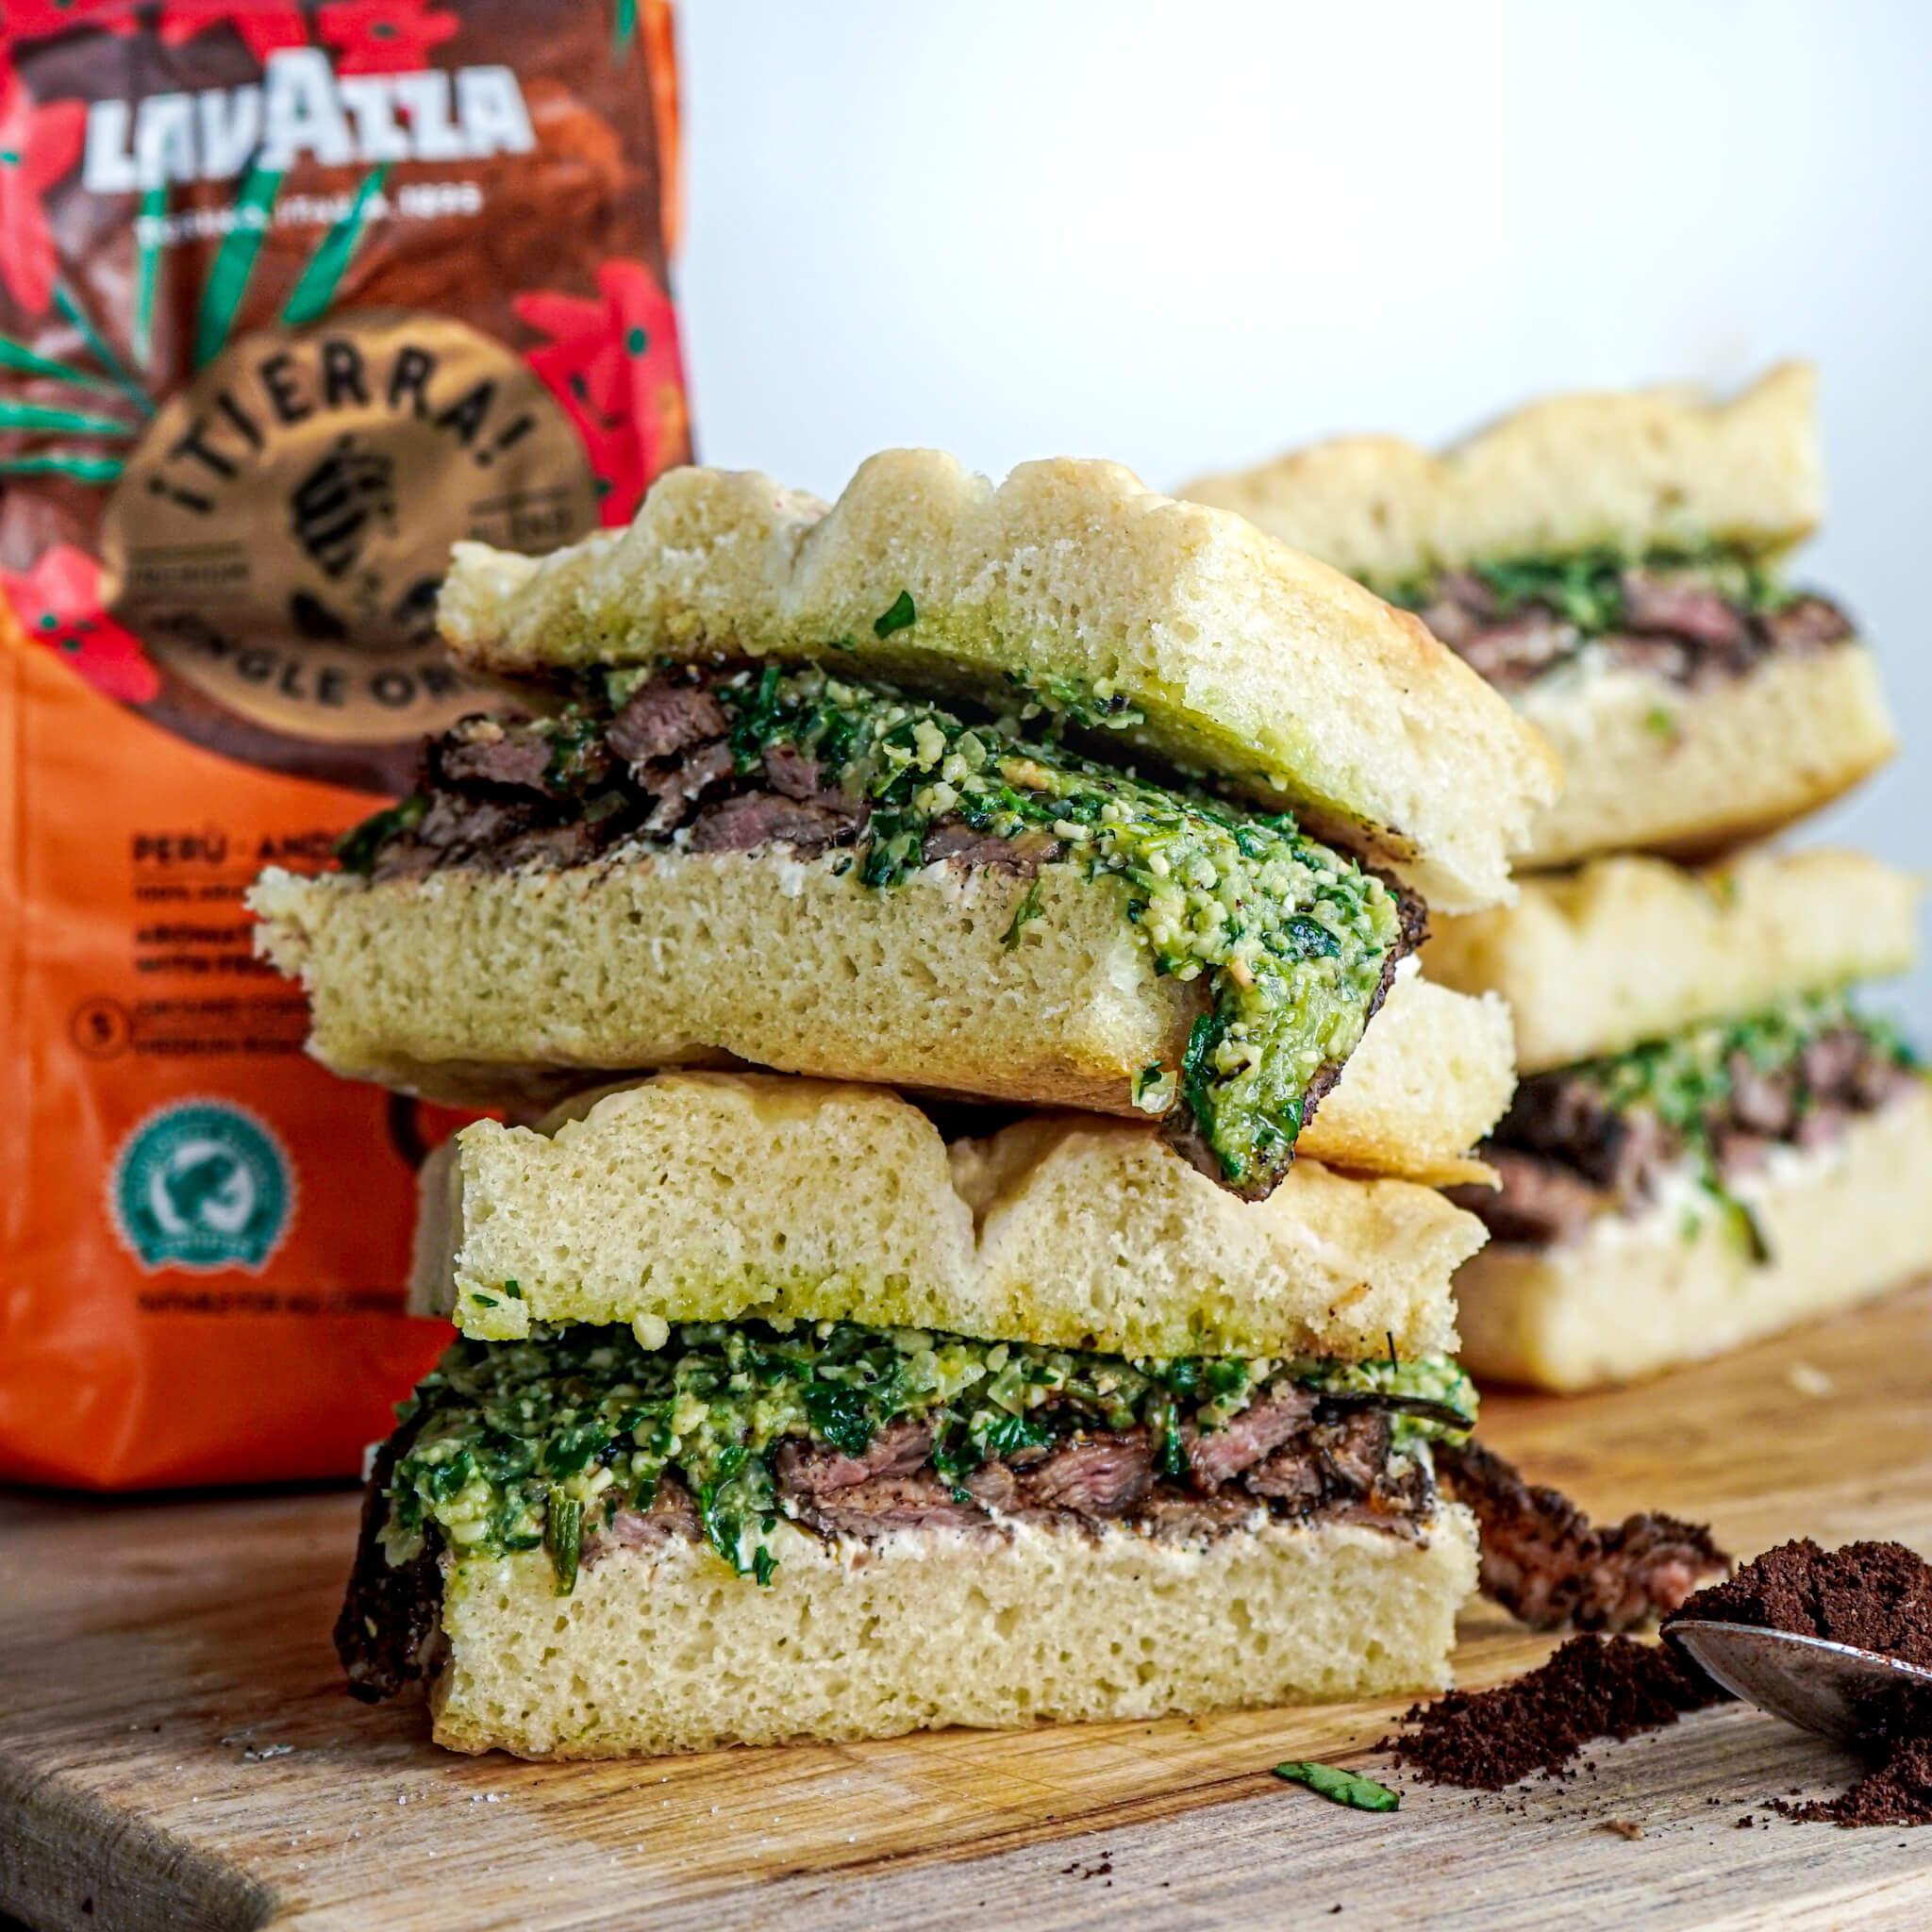 Lavazza steak sandwich 1